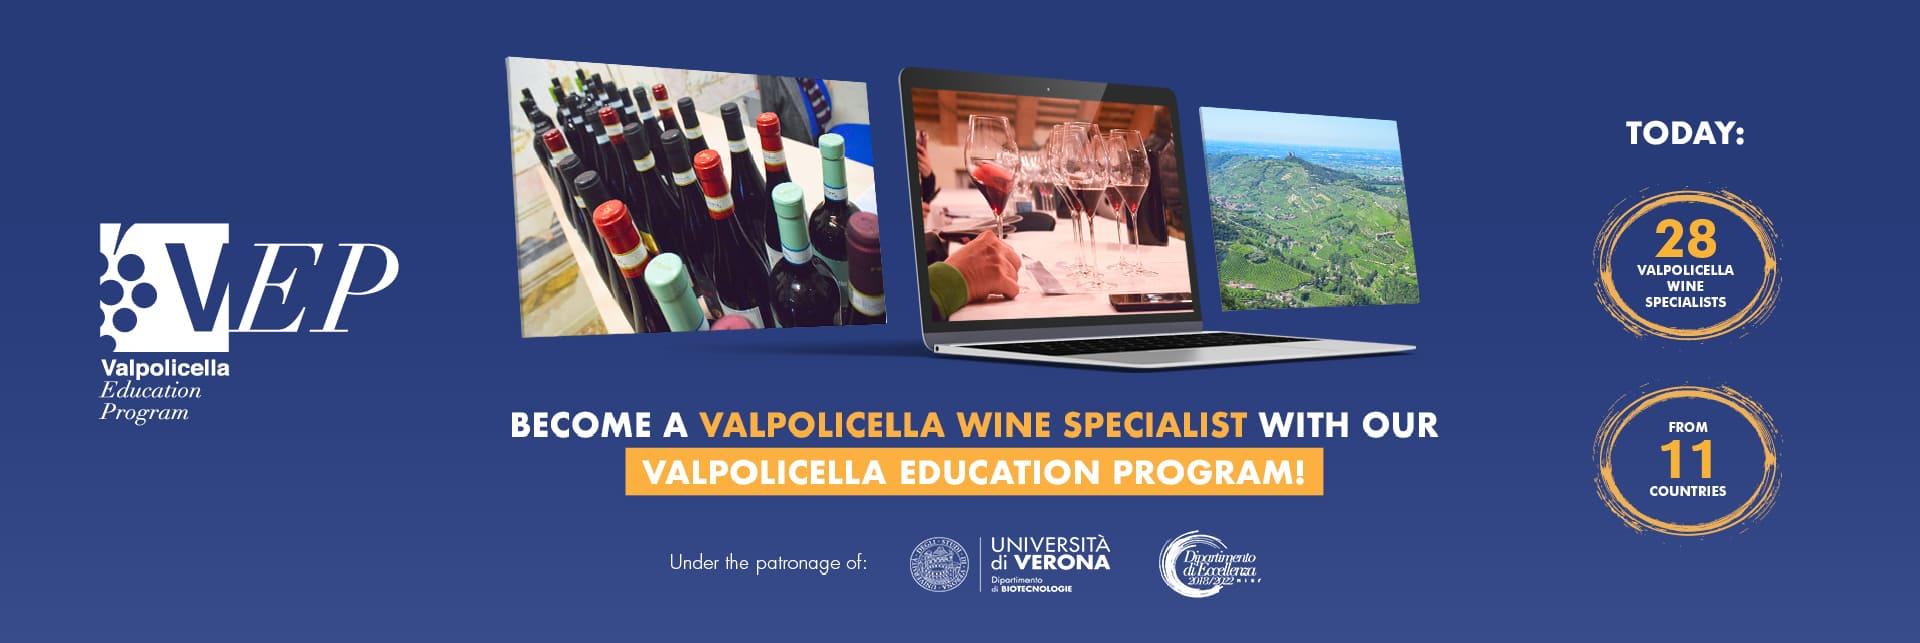 valpolicella education program del consorzio valpolicella